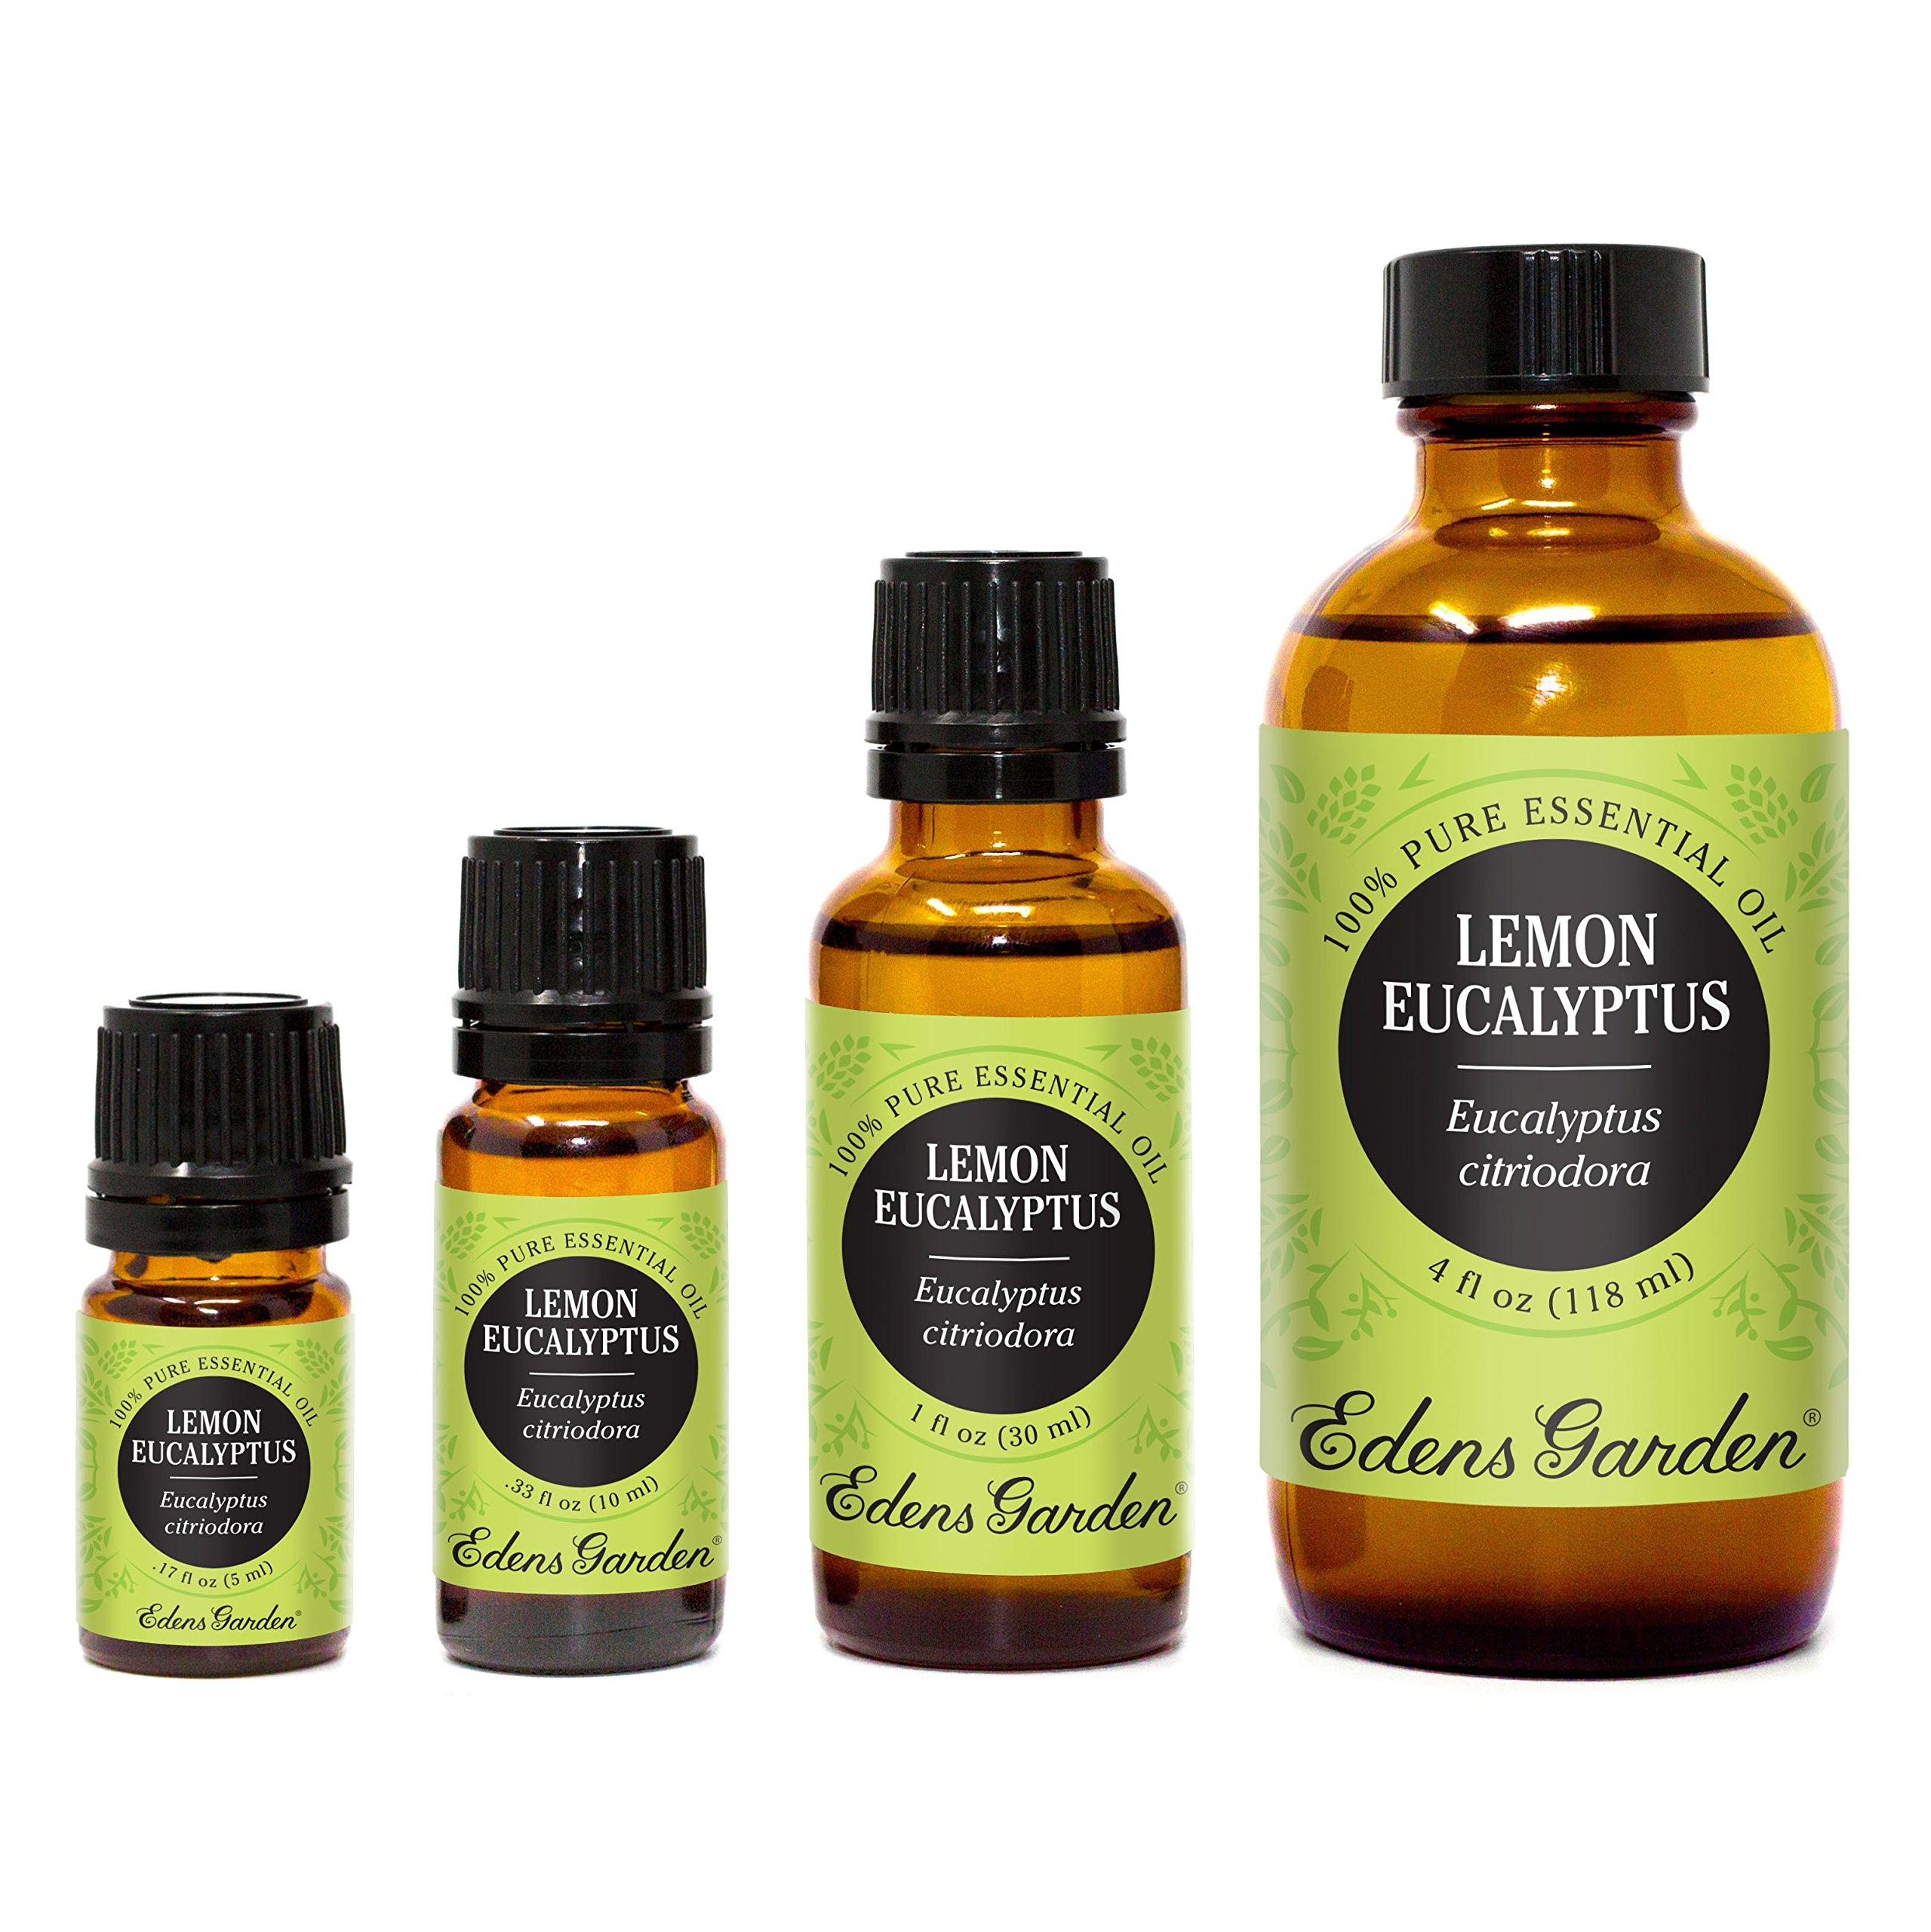 Lemon Eucalyptus 100% Pure Therapeutic Grade Essential Oil - 30 ml